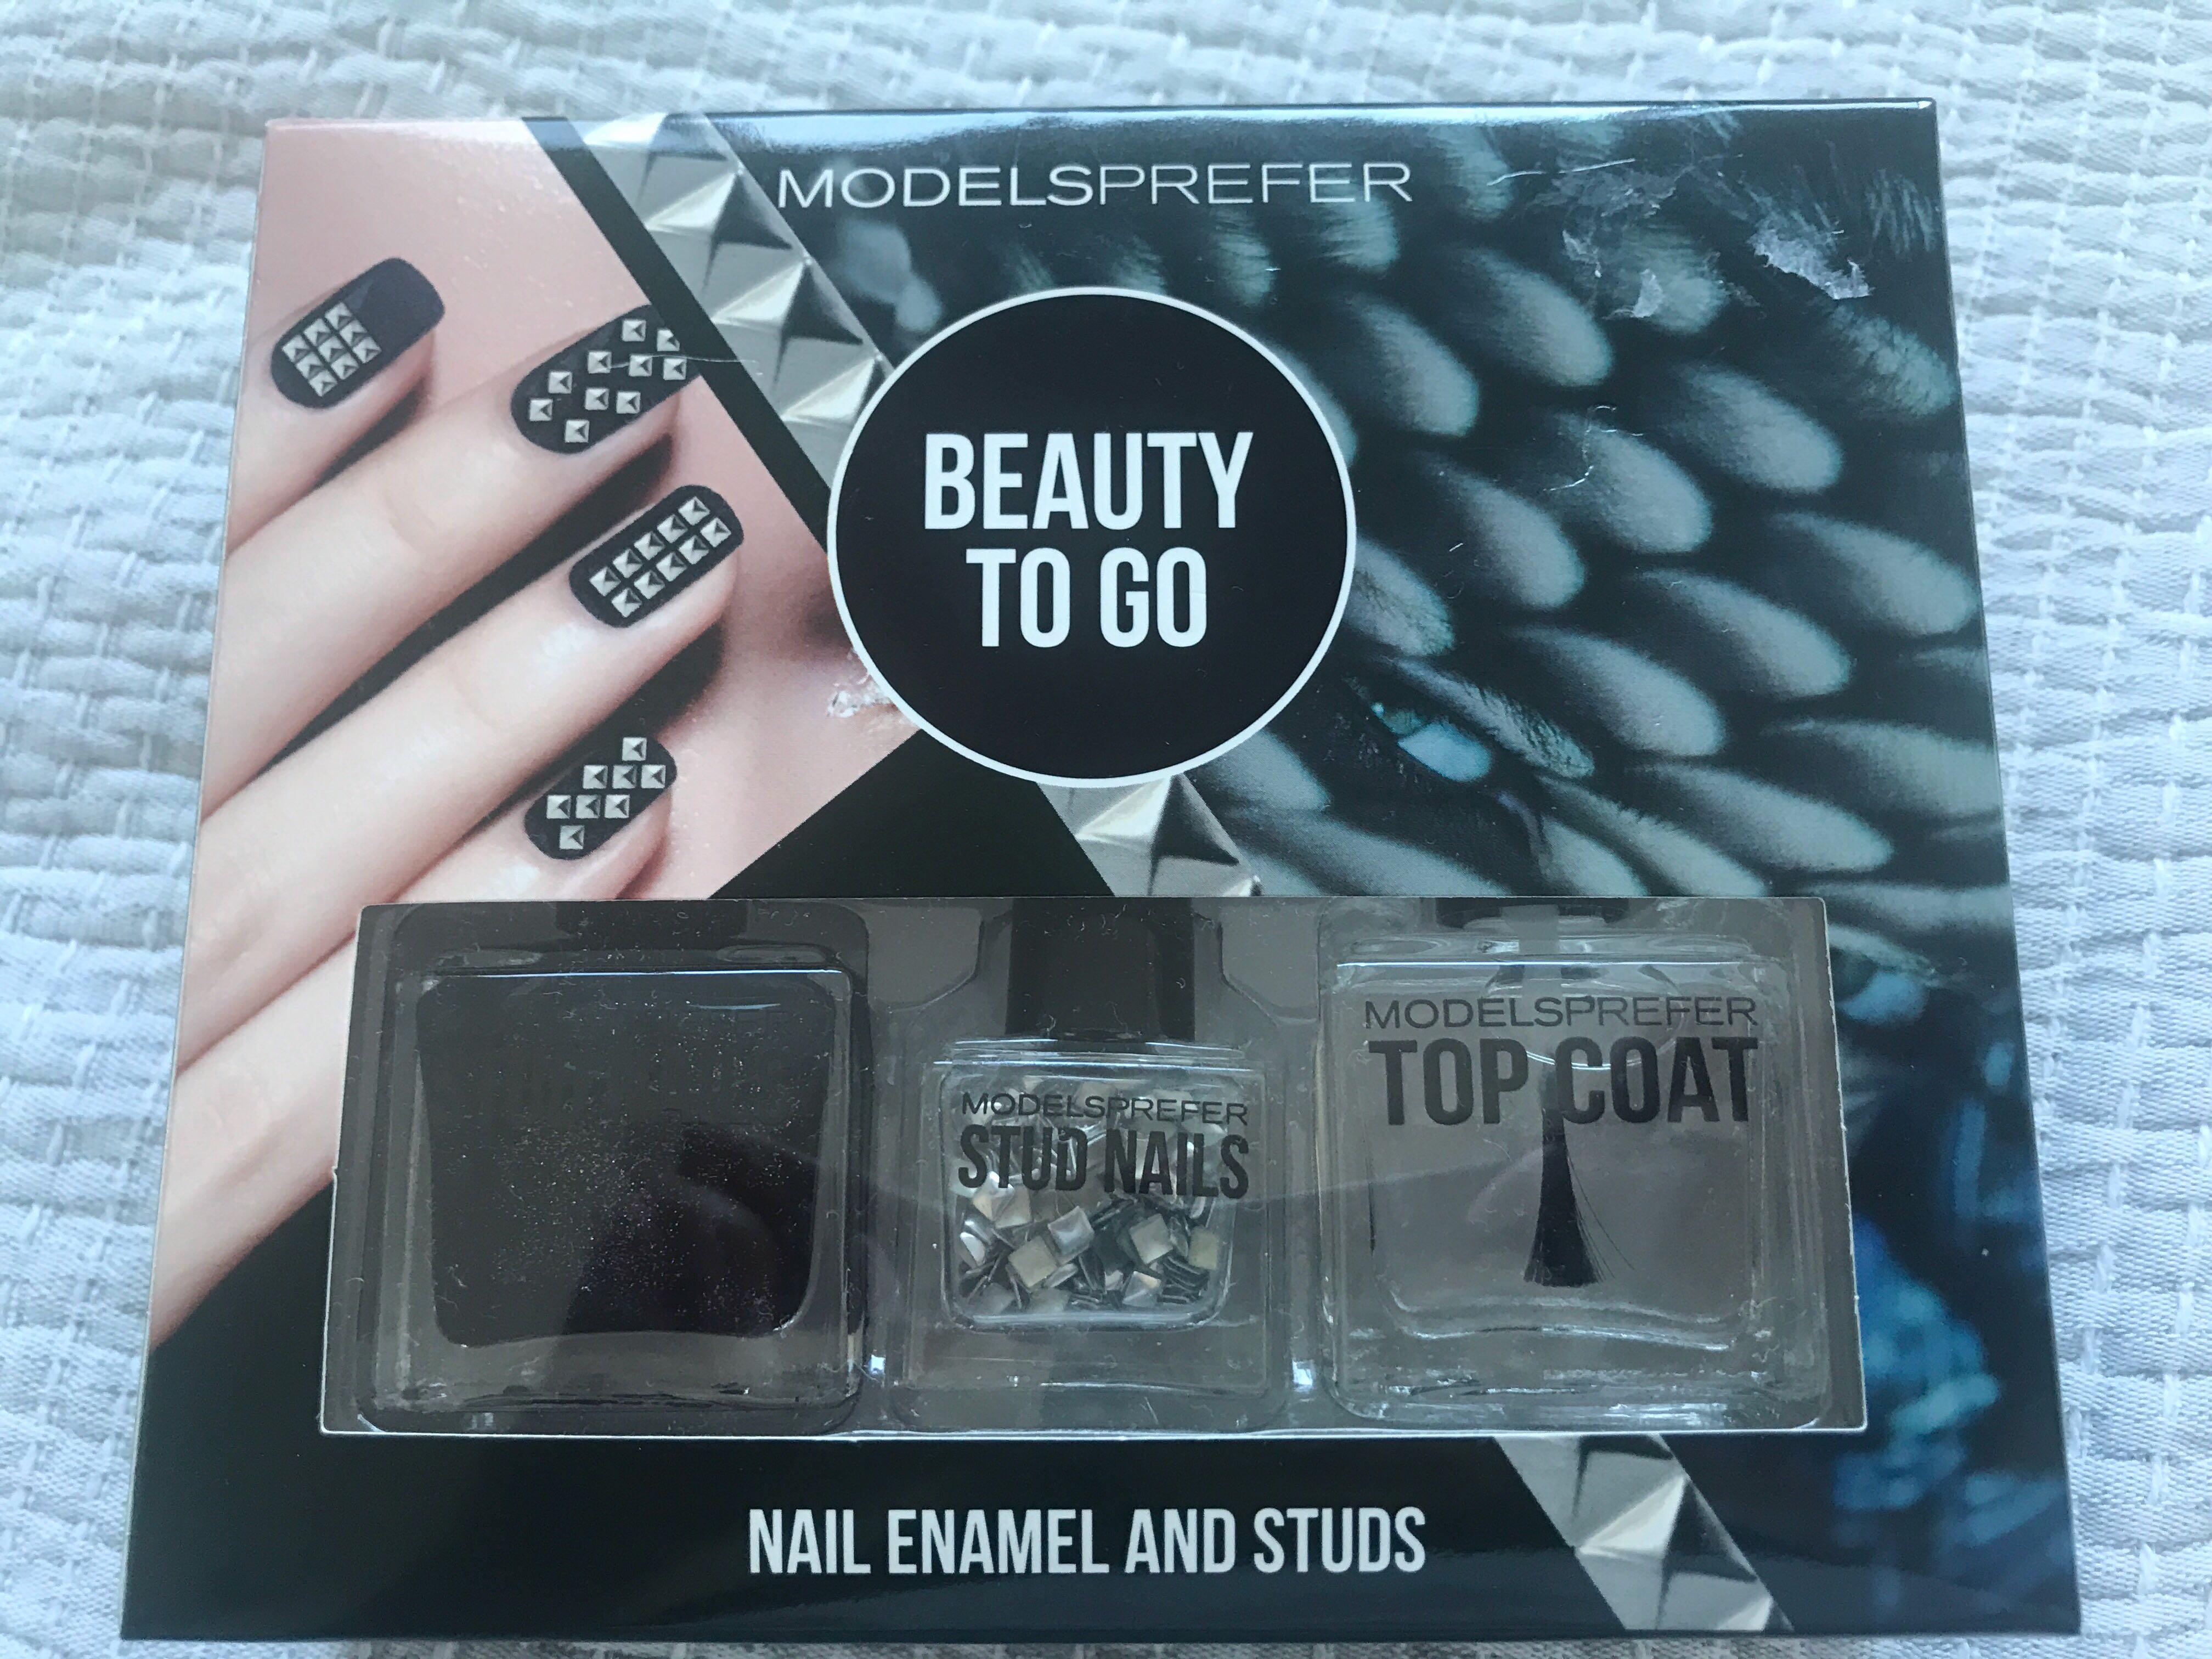 Modelsprefer nail enamel and studs + top coat heavy mental + silver studs